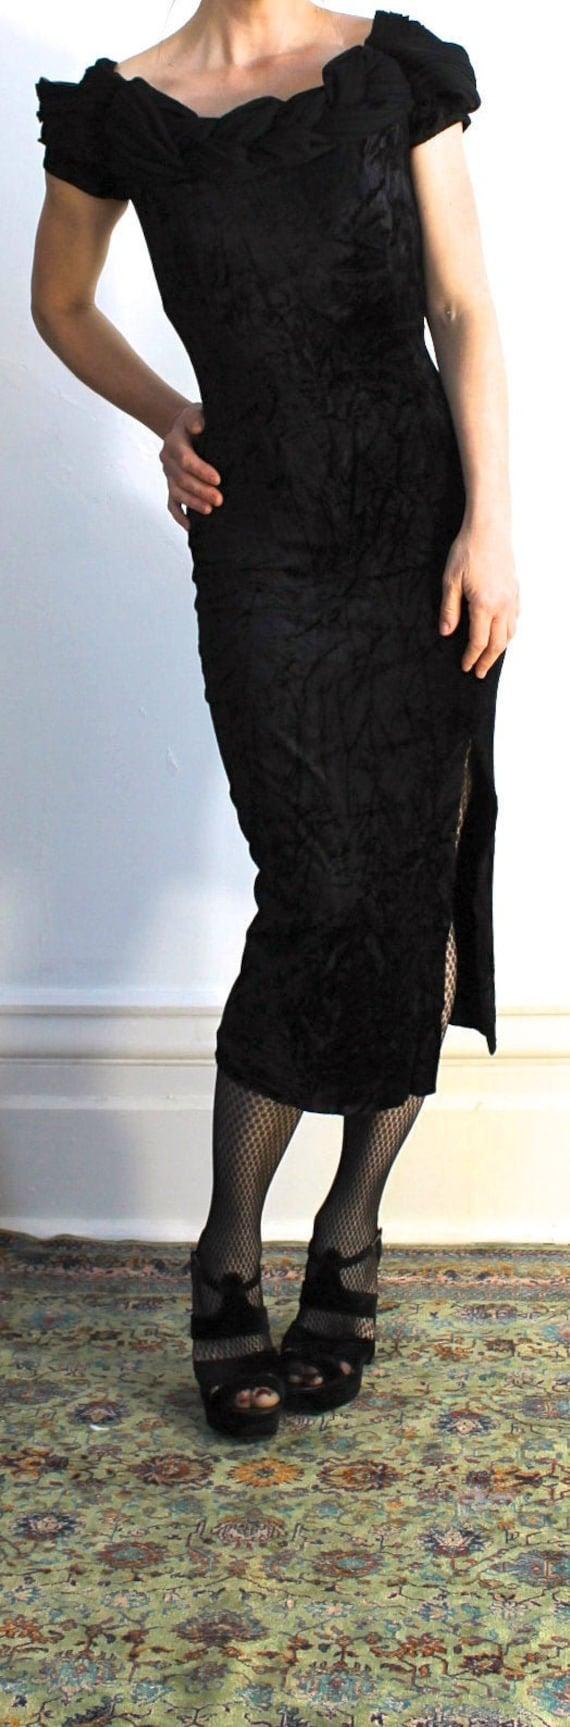 Vintage Black Crushed Velvet Body Con Dress/